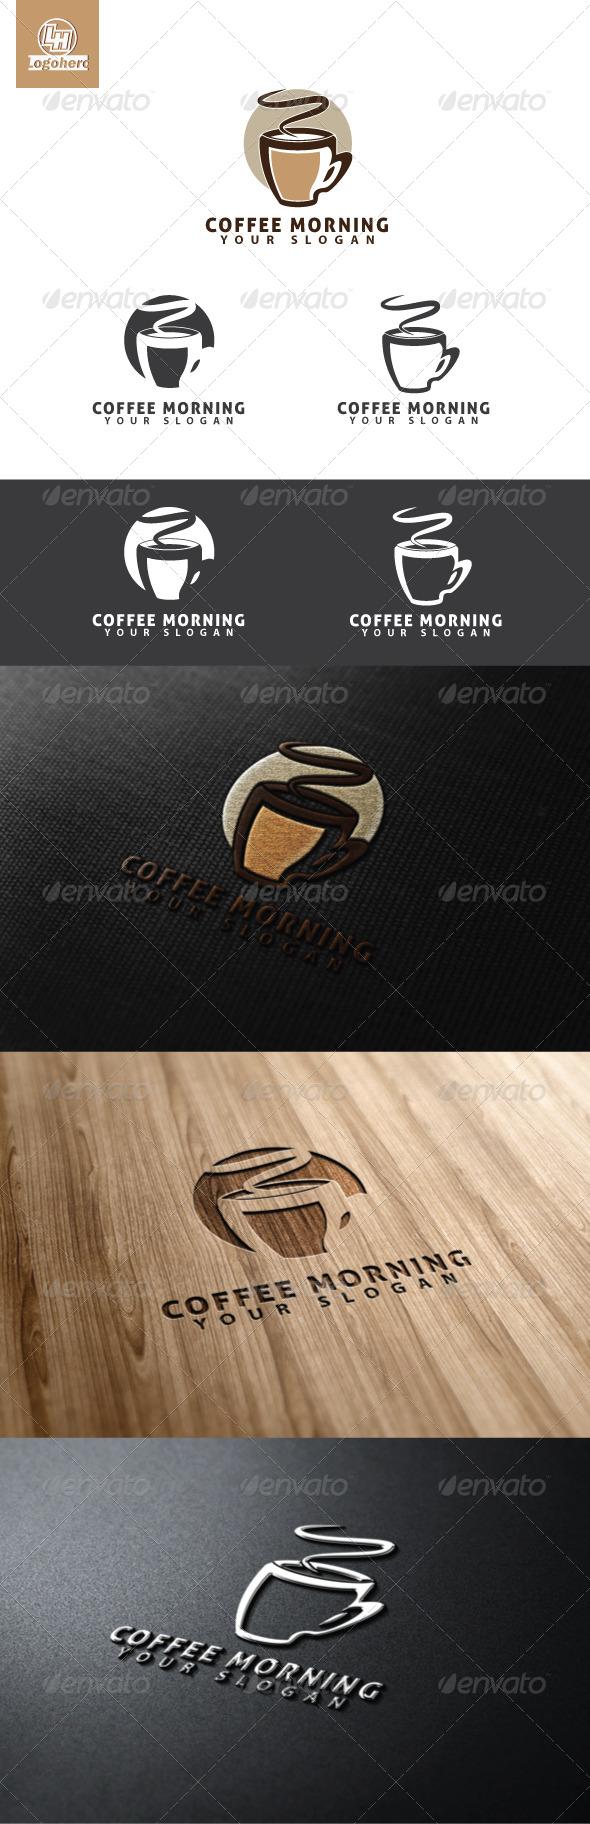 Coffee Morning Logo Template - Food Logo Templates